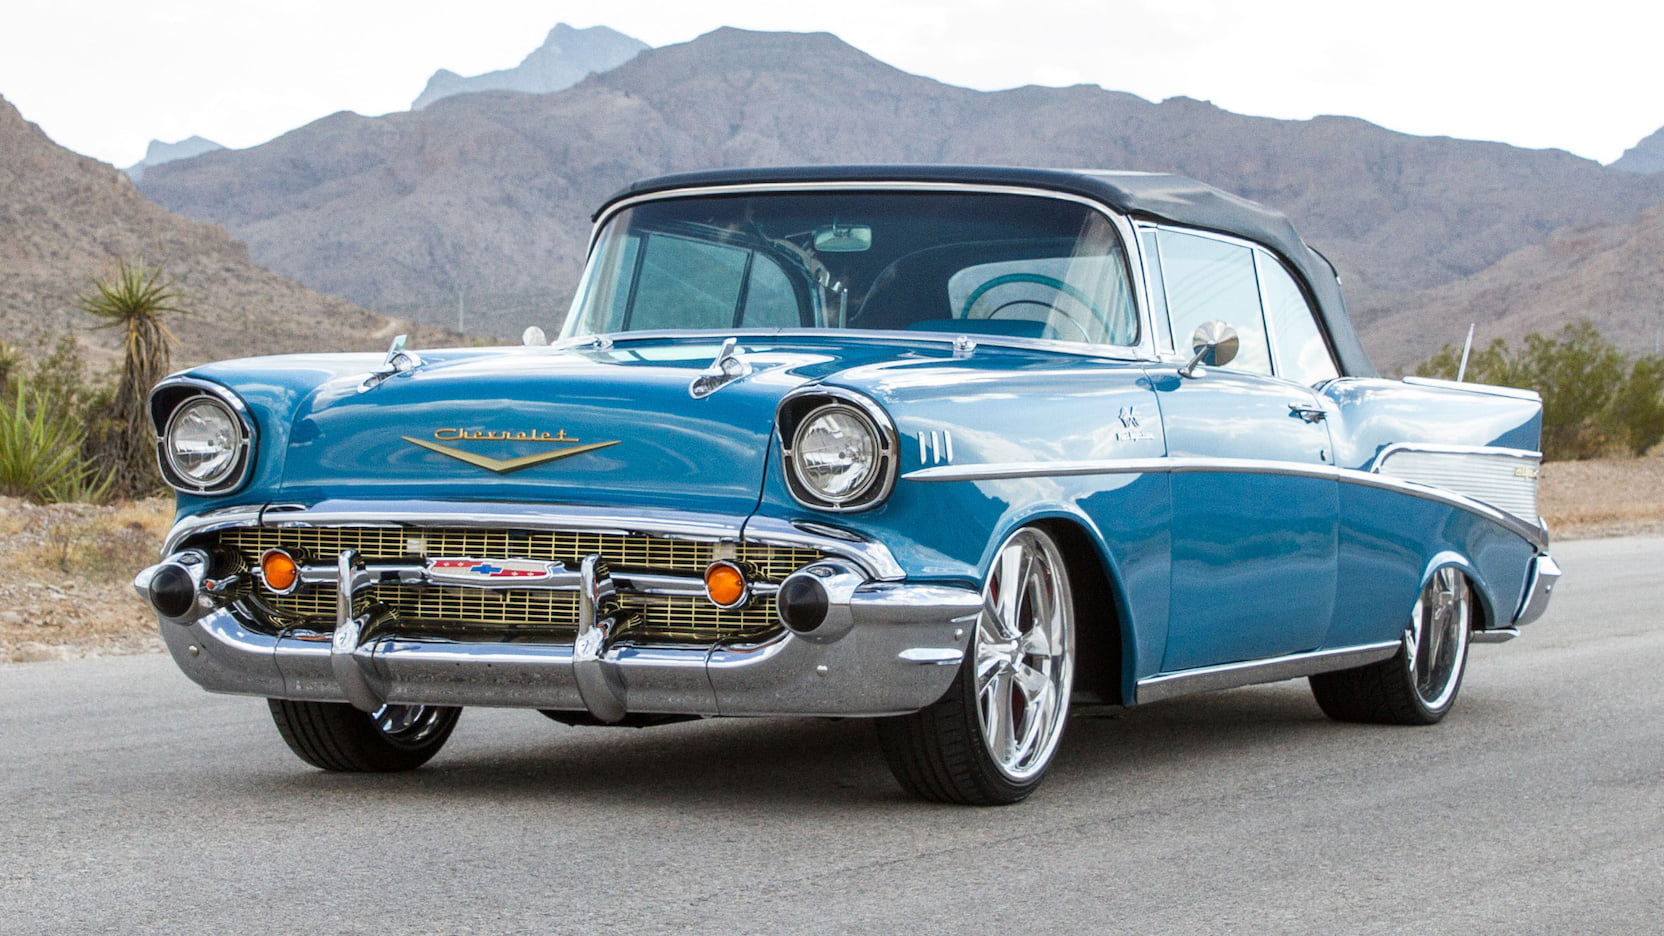 Classic Car Wallpaper 57 Chevy 1957 Chevrolet Bel Air Resto Mod T28 1 Kissimmee 2018